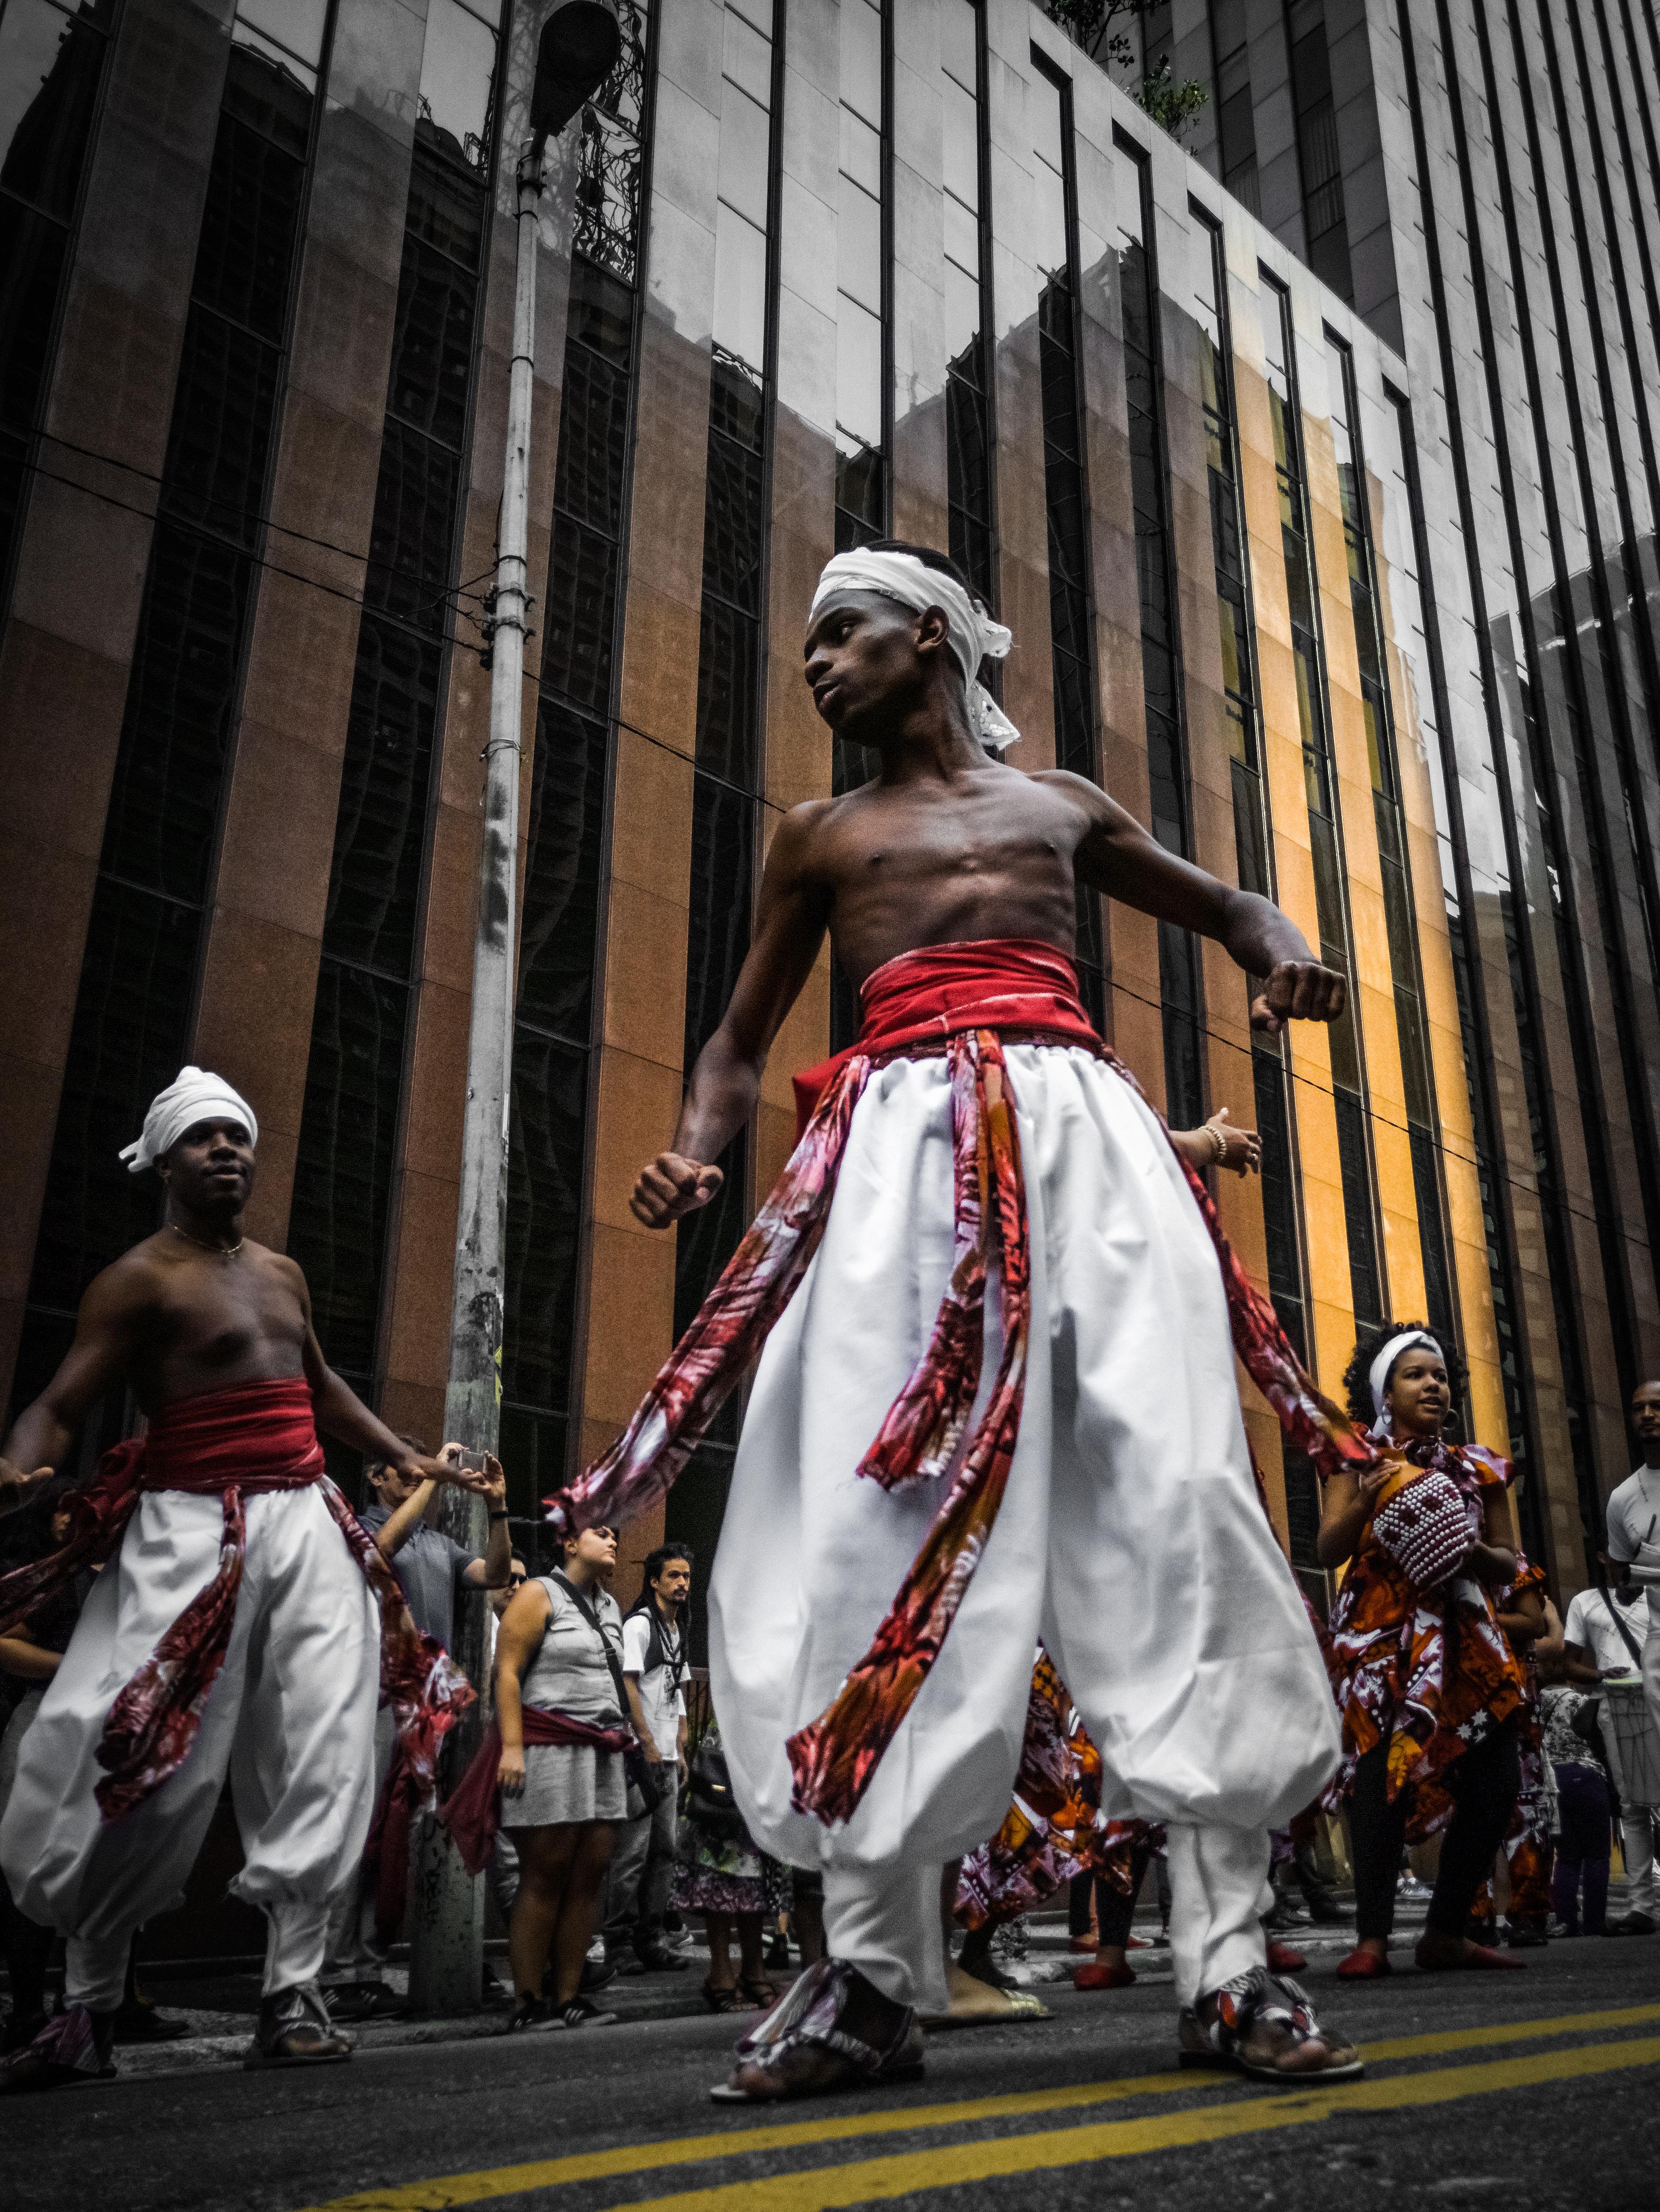 Dancing man - OnePlus3 - Sao Paulo.jpg